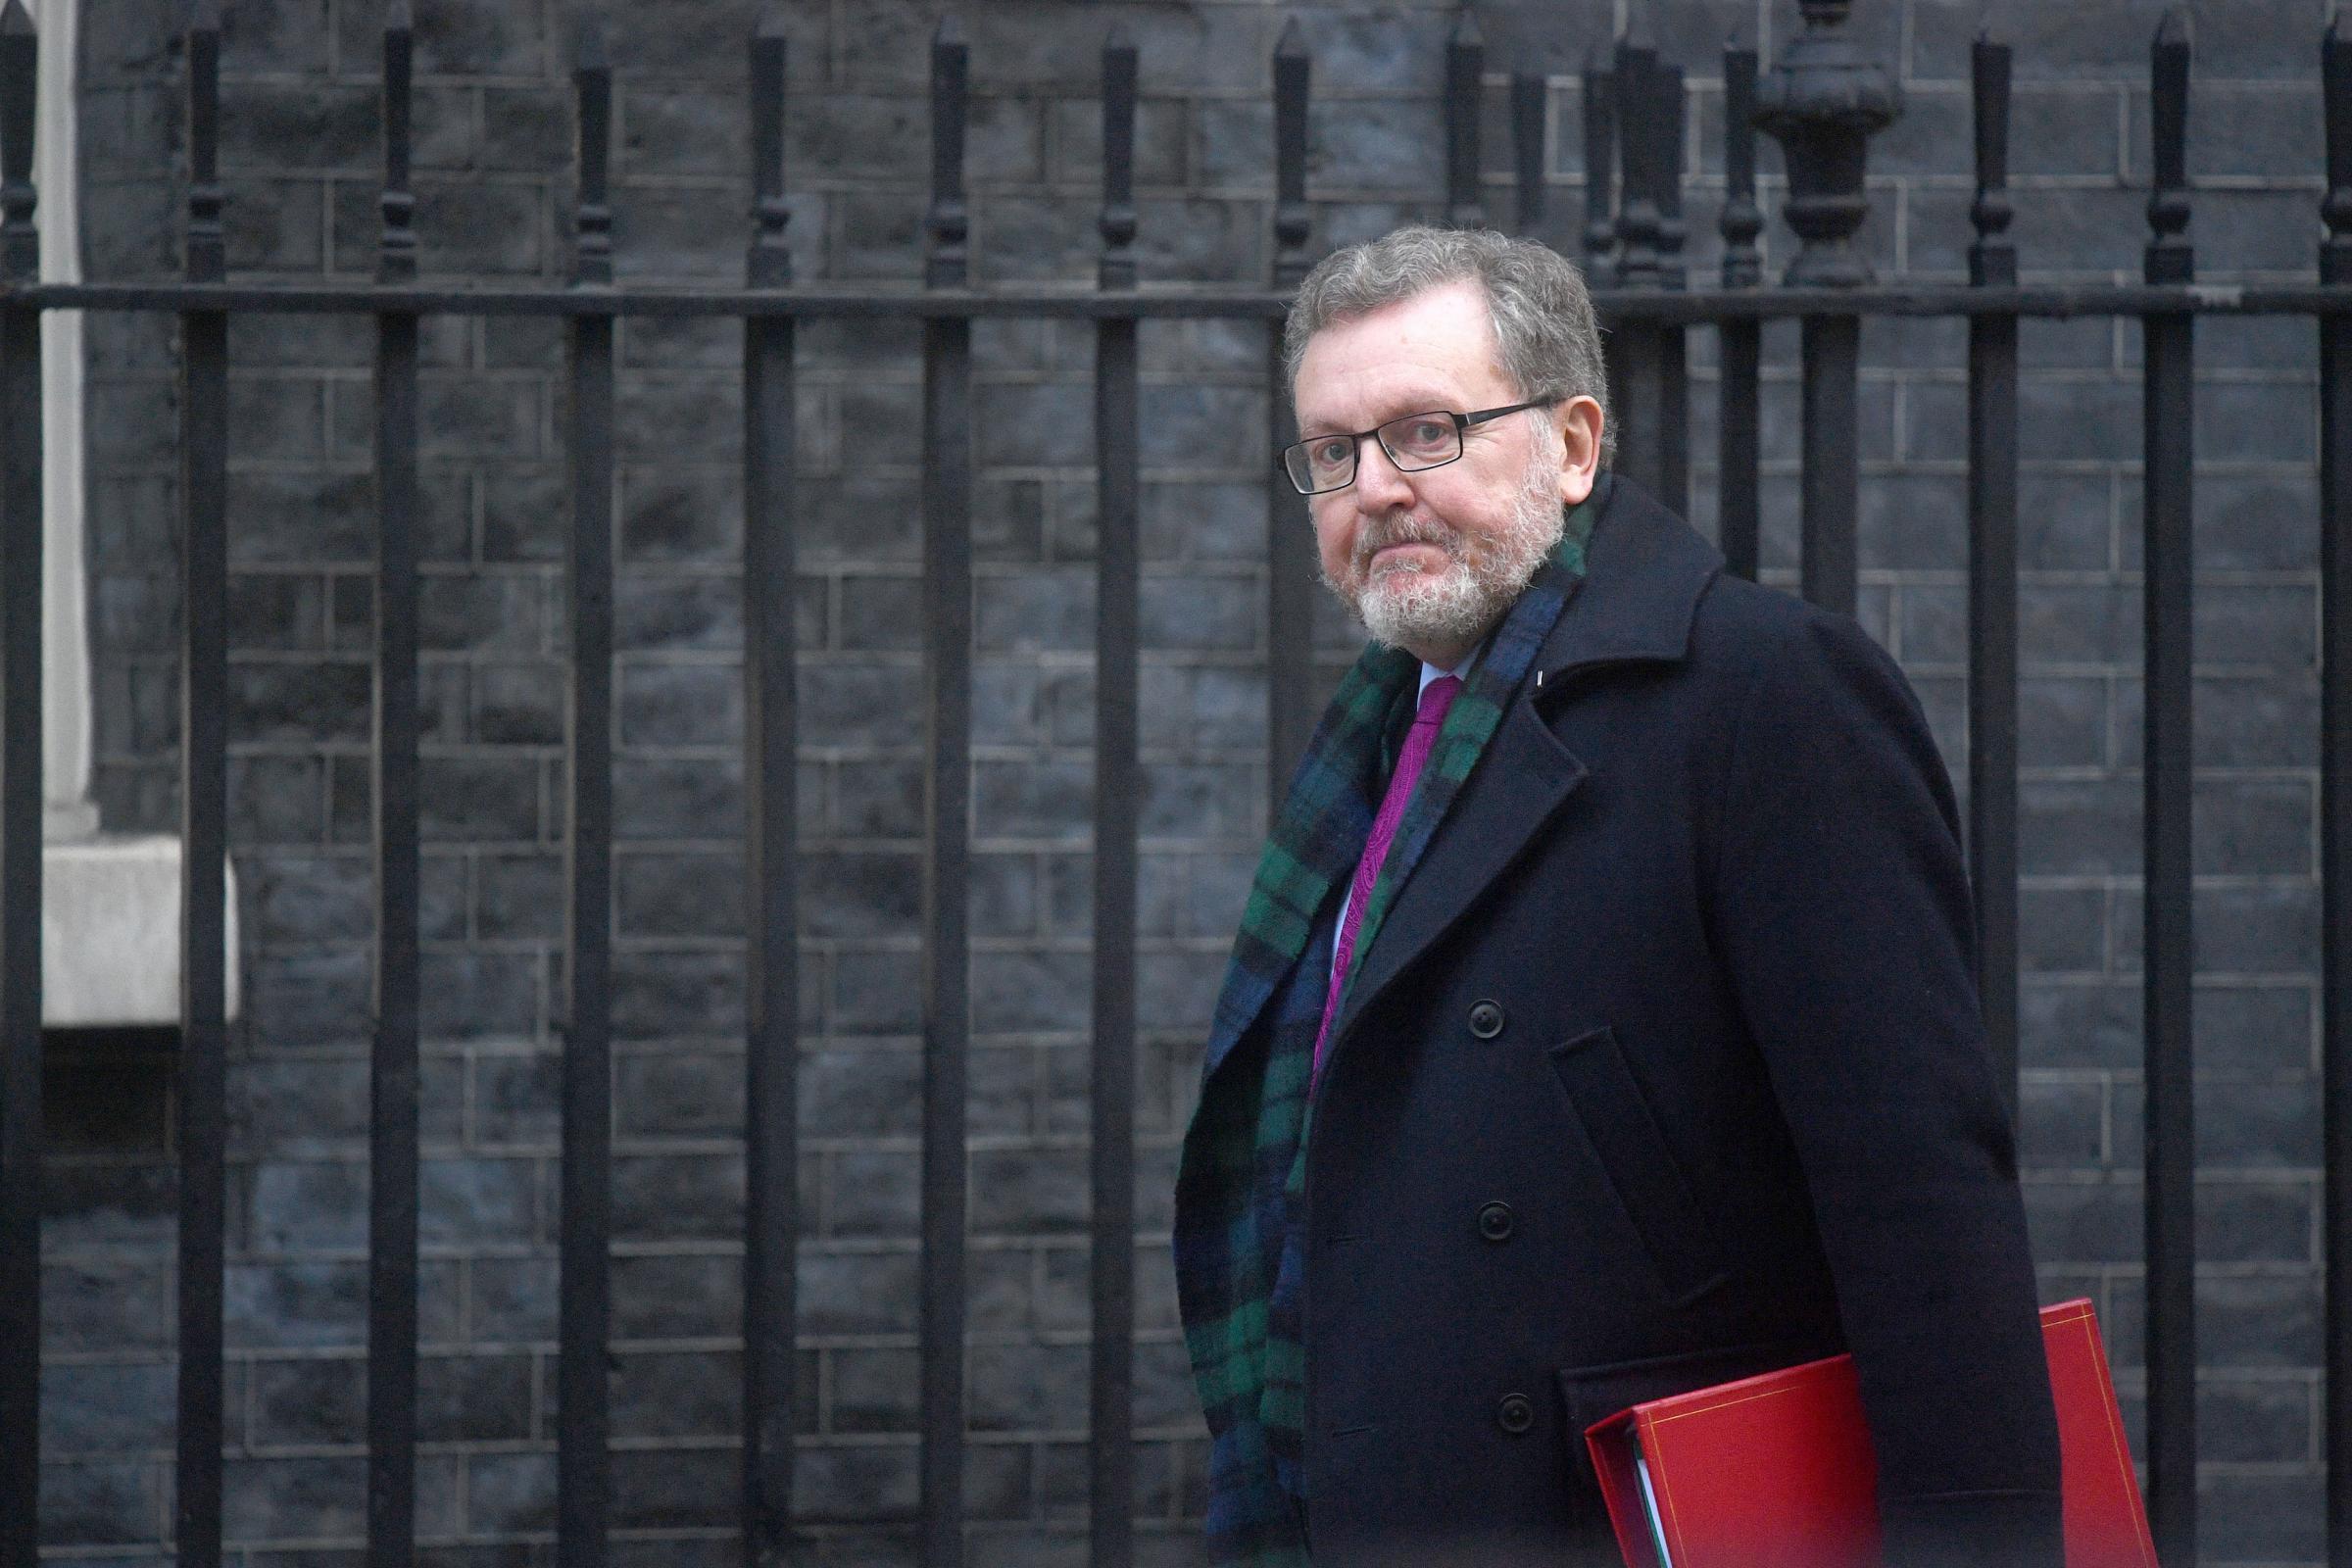 'Rank hypocrisy' – £120k spent on David Mundell's foreign trips